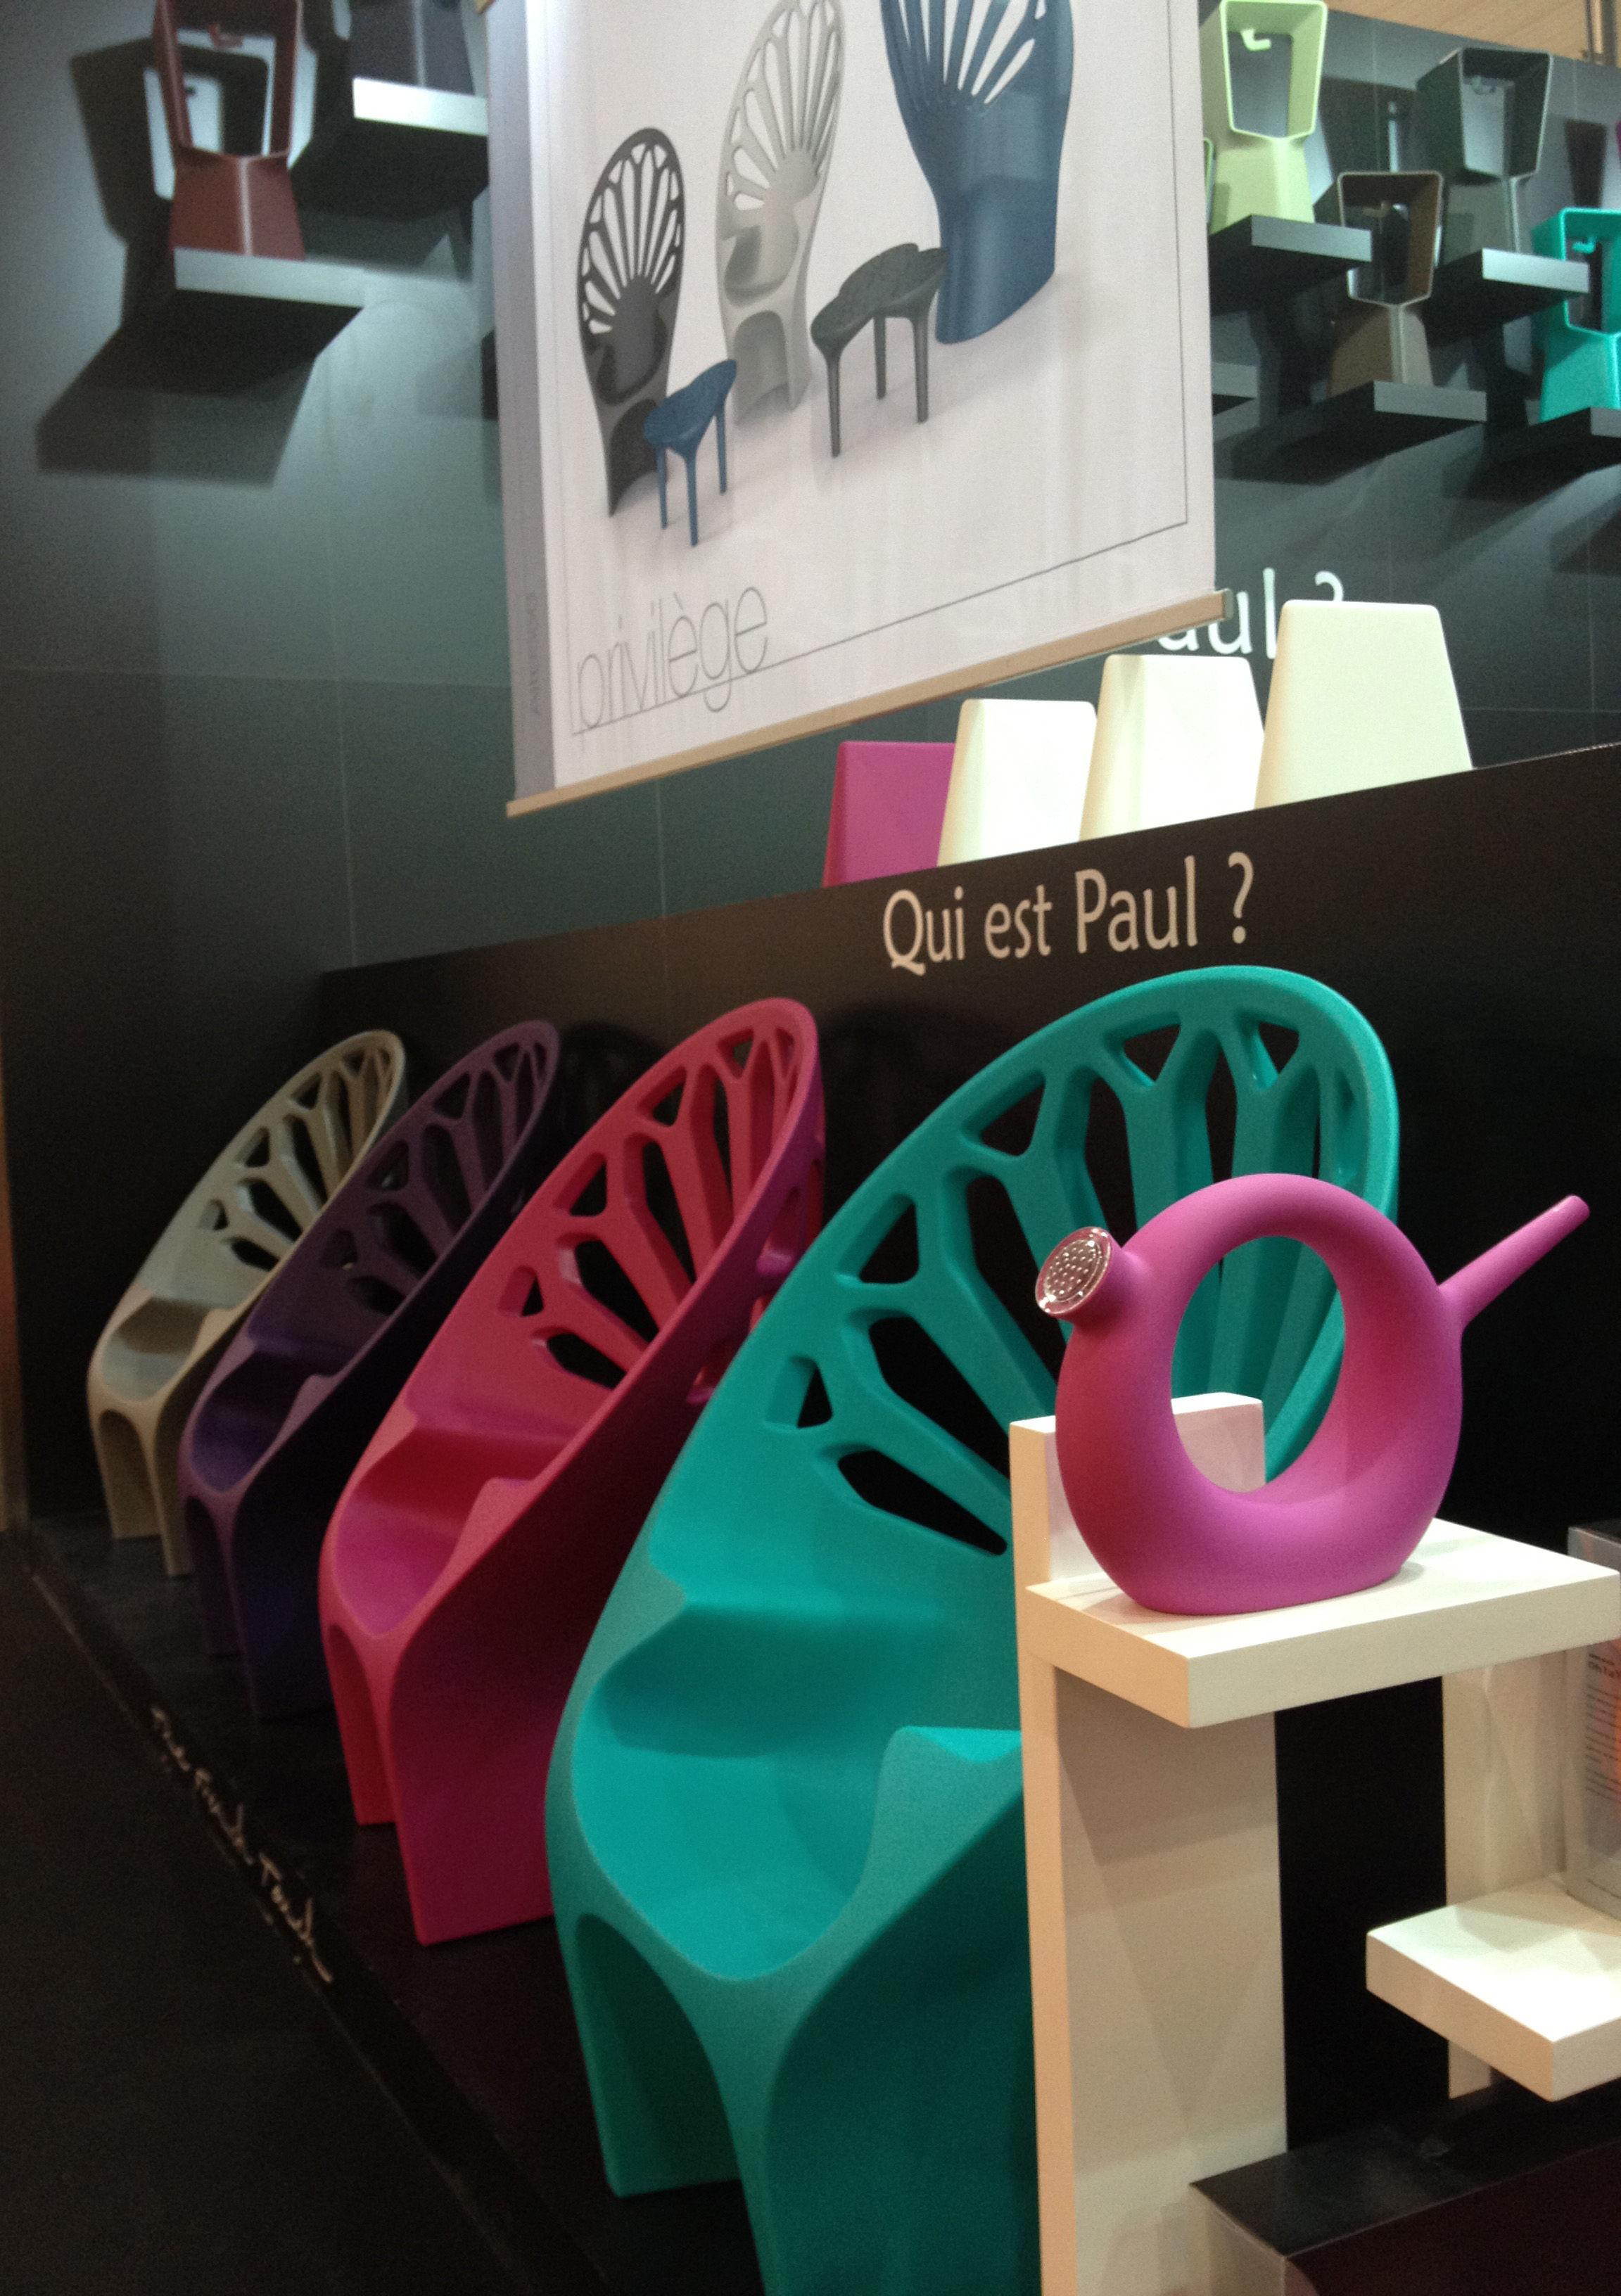 fauteuil altesse gris qui est paul made in design. Black Bedroom Furniture Sets. Home Design Ideas